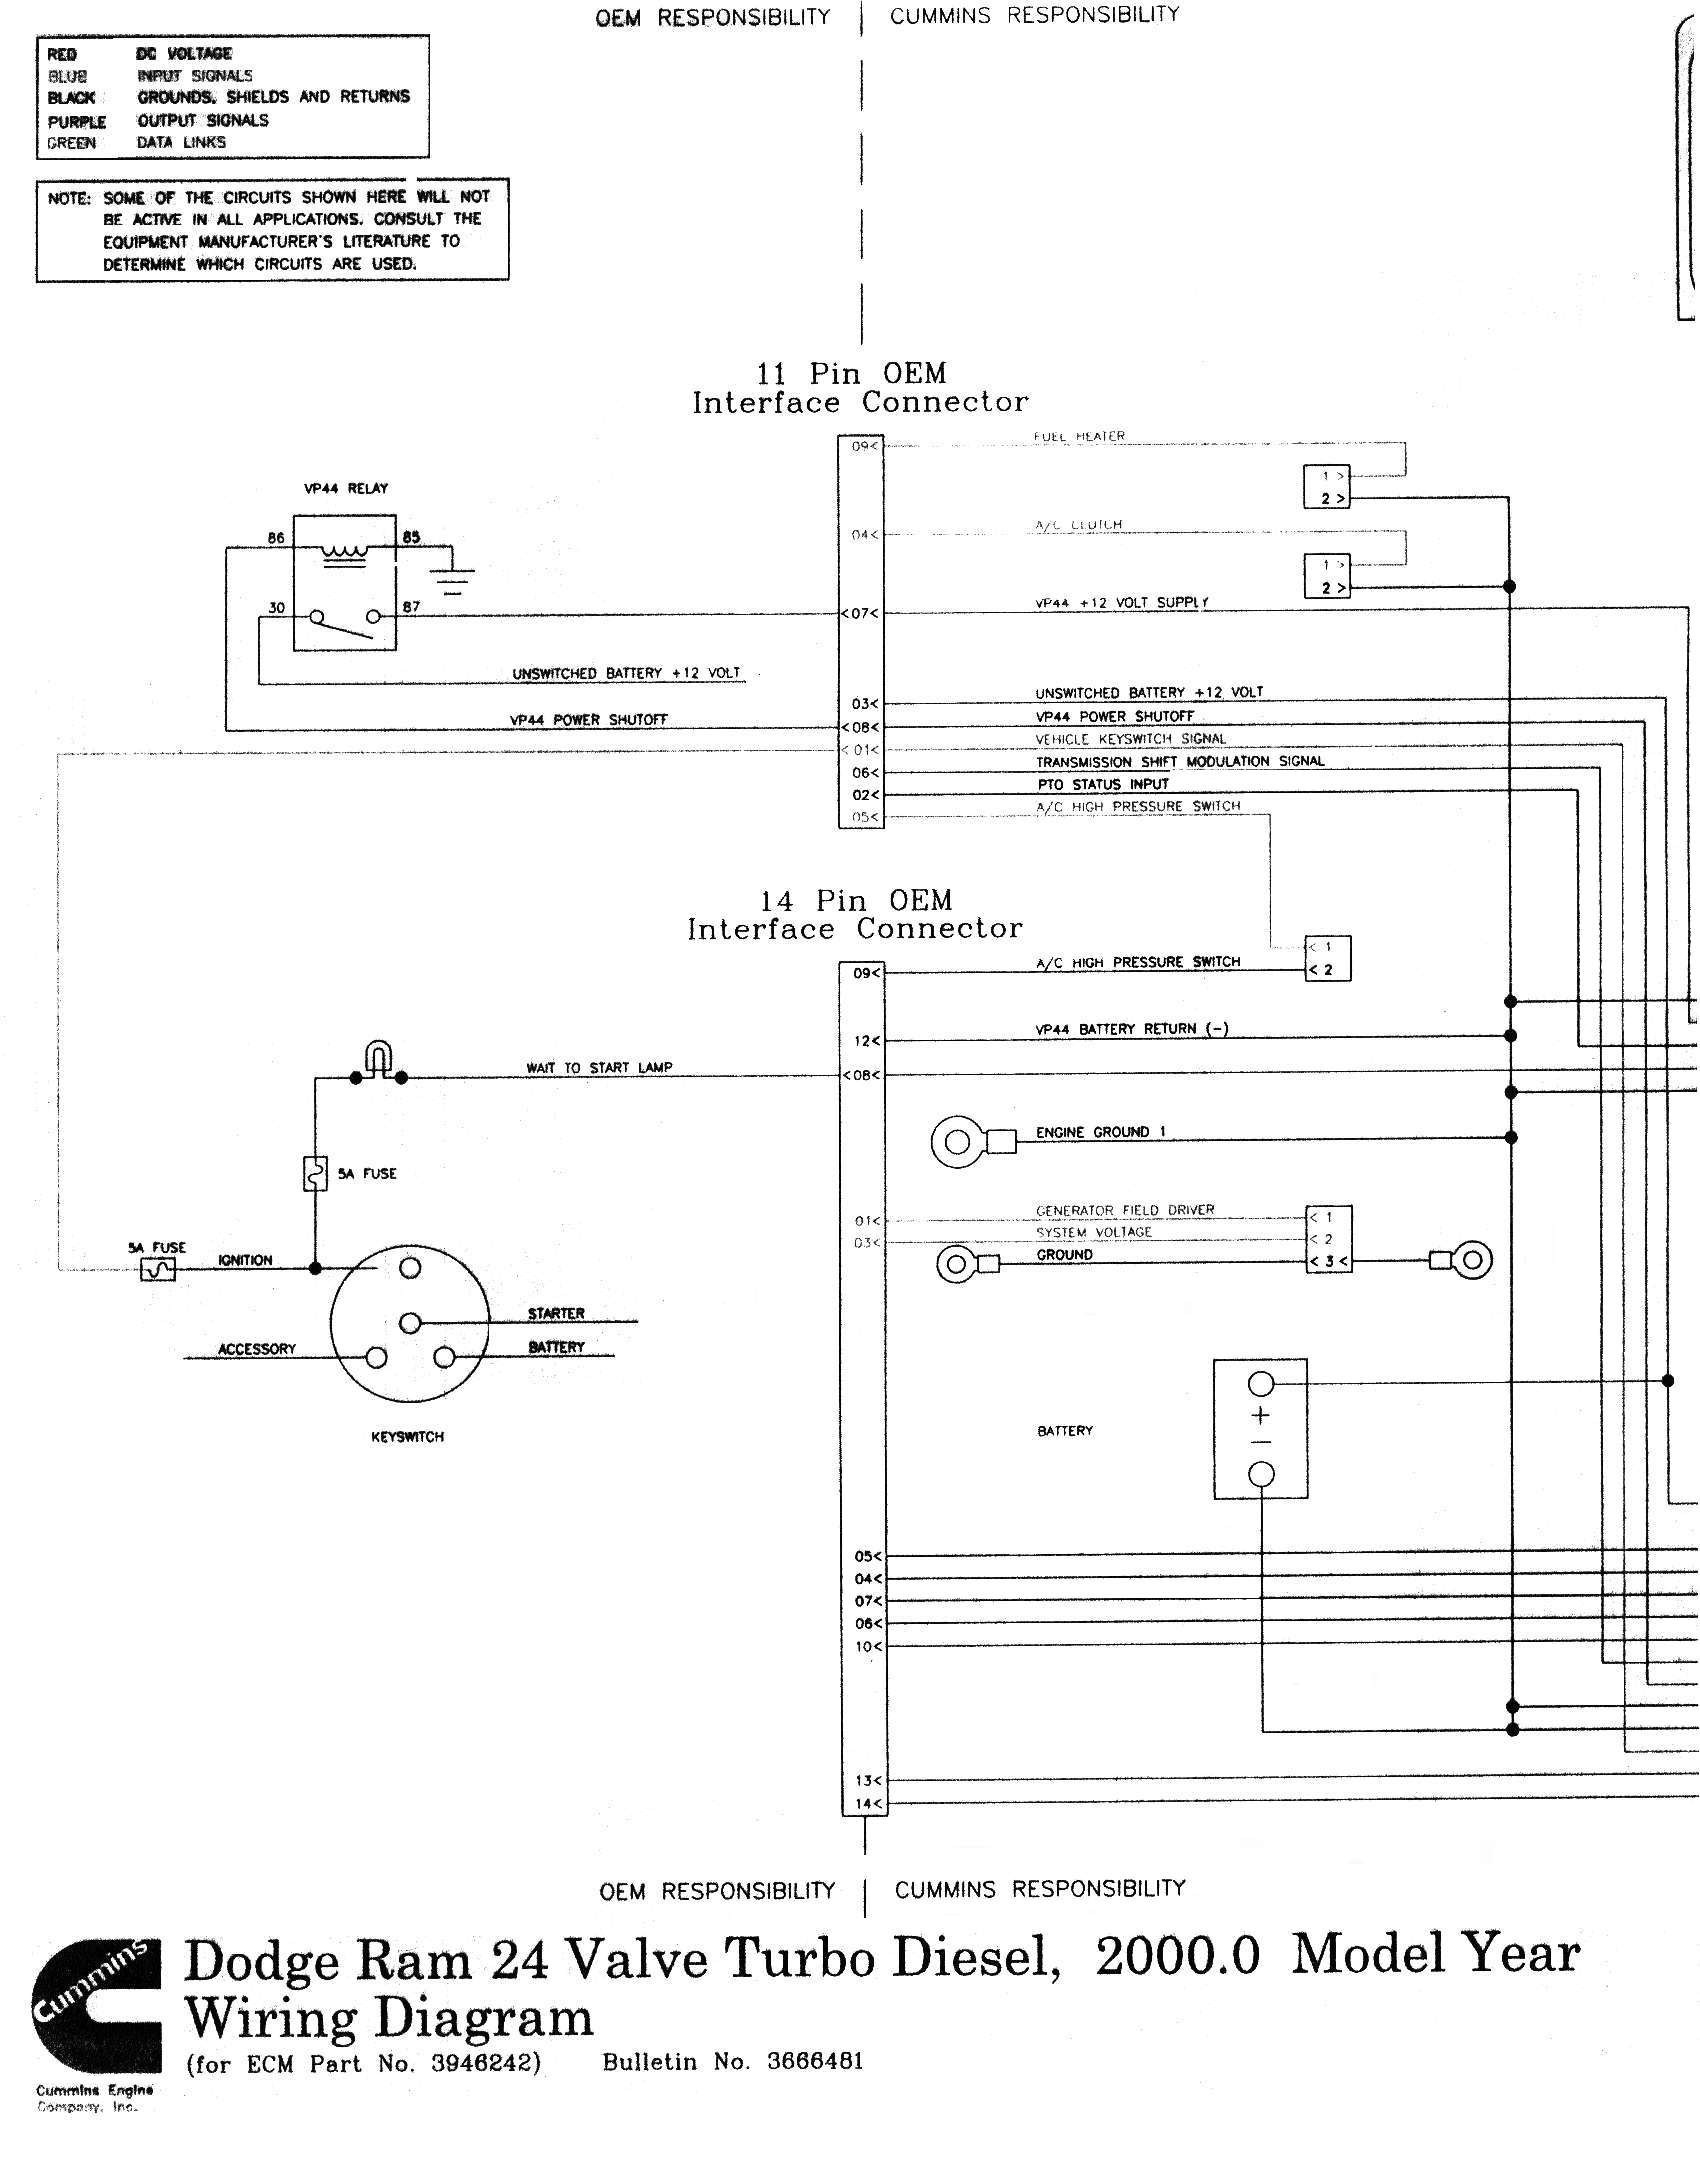 Dodge Truck Wiring Diagrams 1999 Dodge Ram 1500 Trailer Wiring Diagram Refrence 2001 Dodge Ram Of Dodge Truck Wiring Diagrams